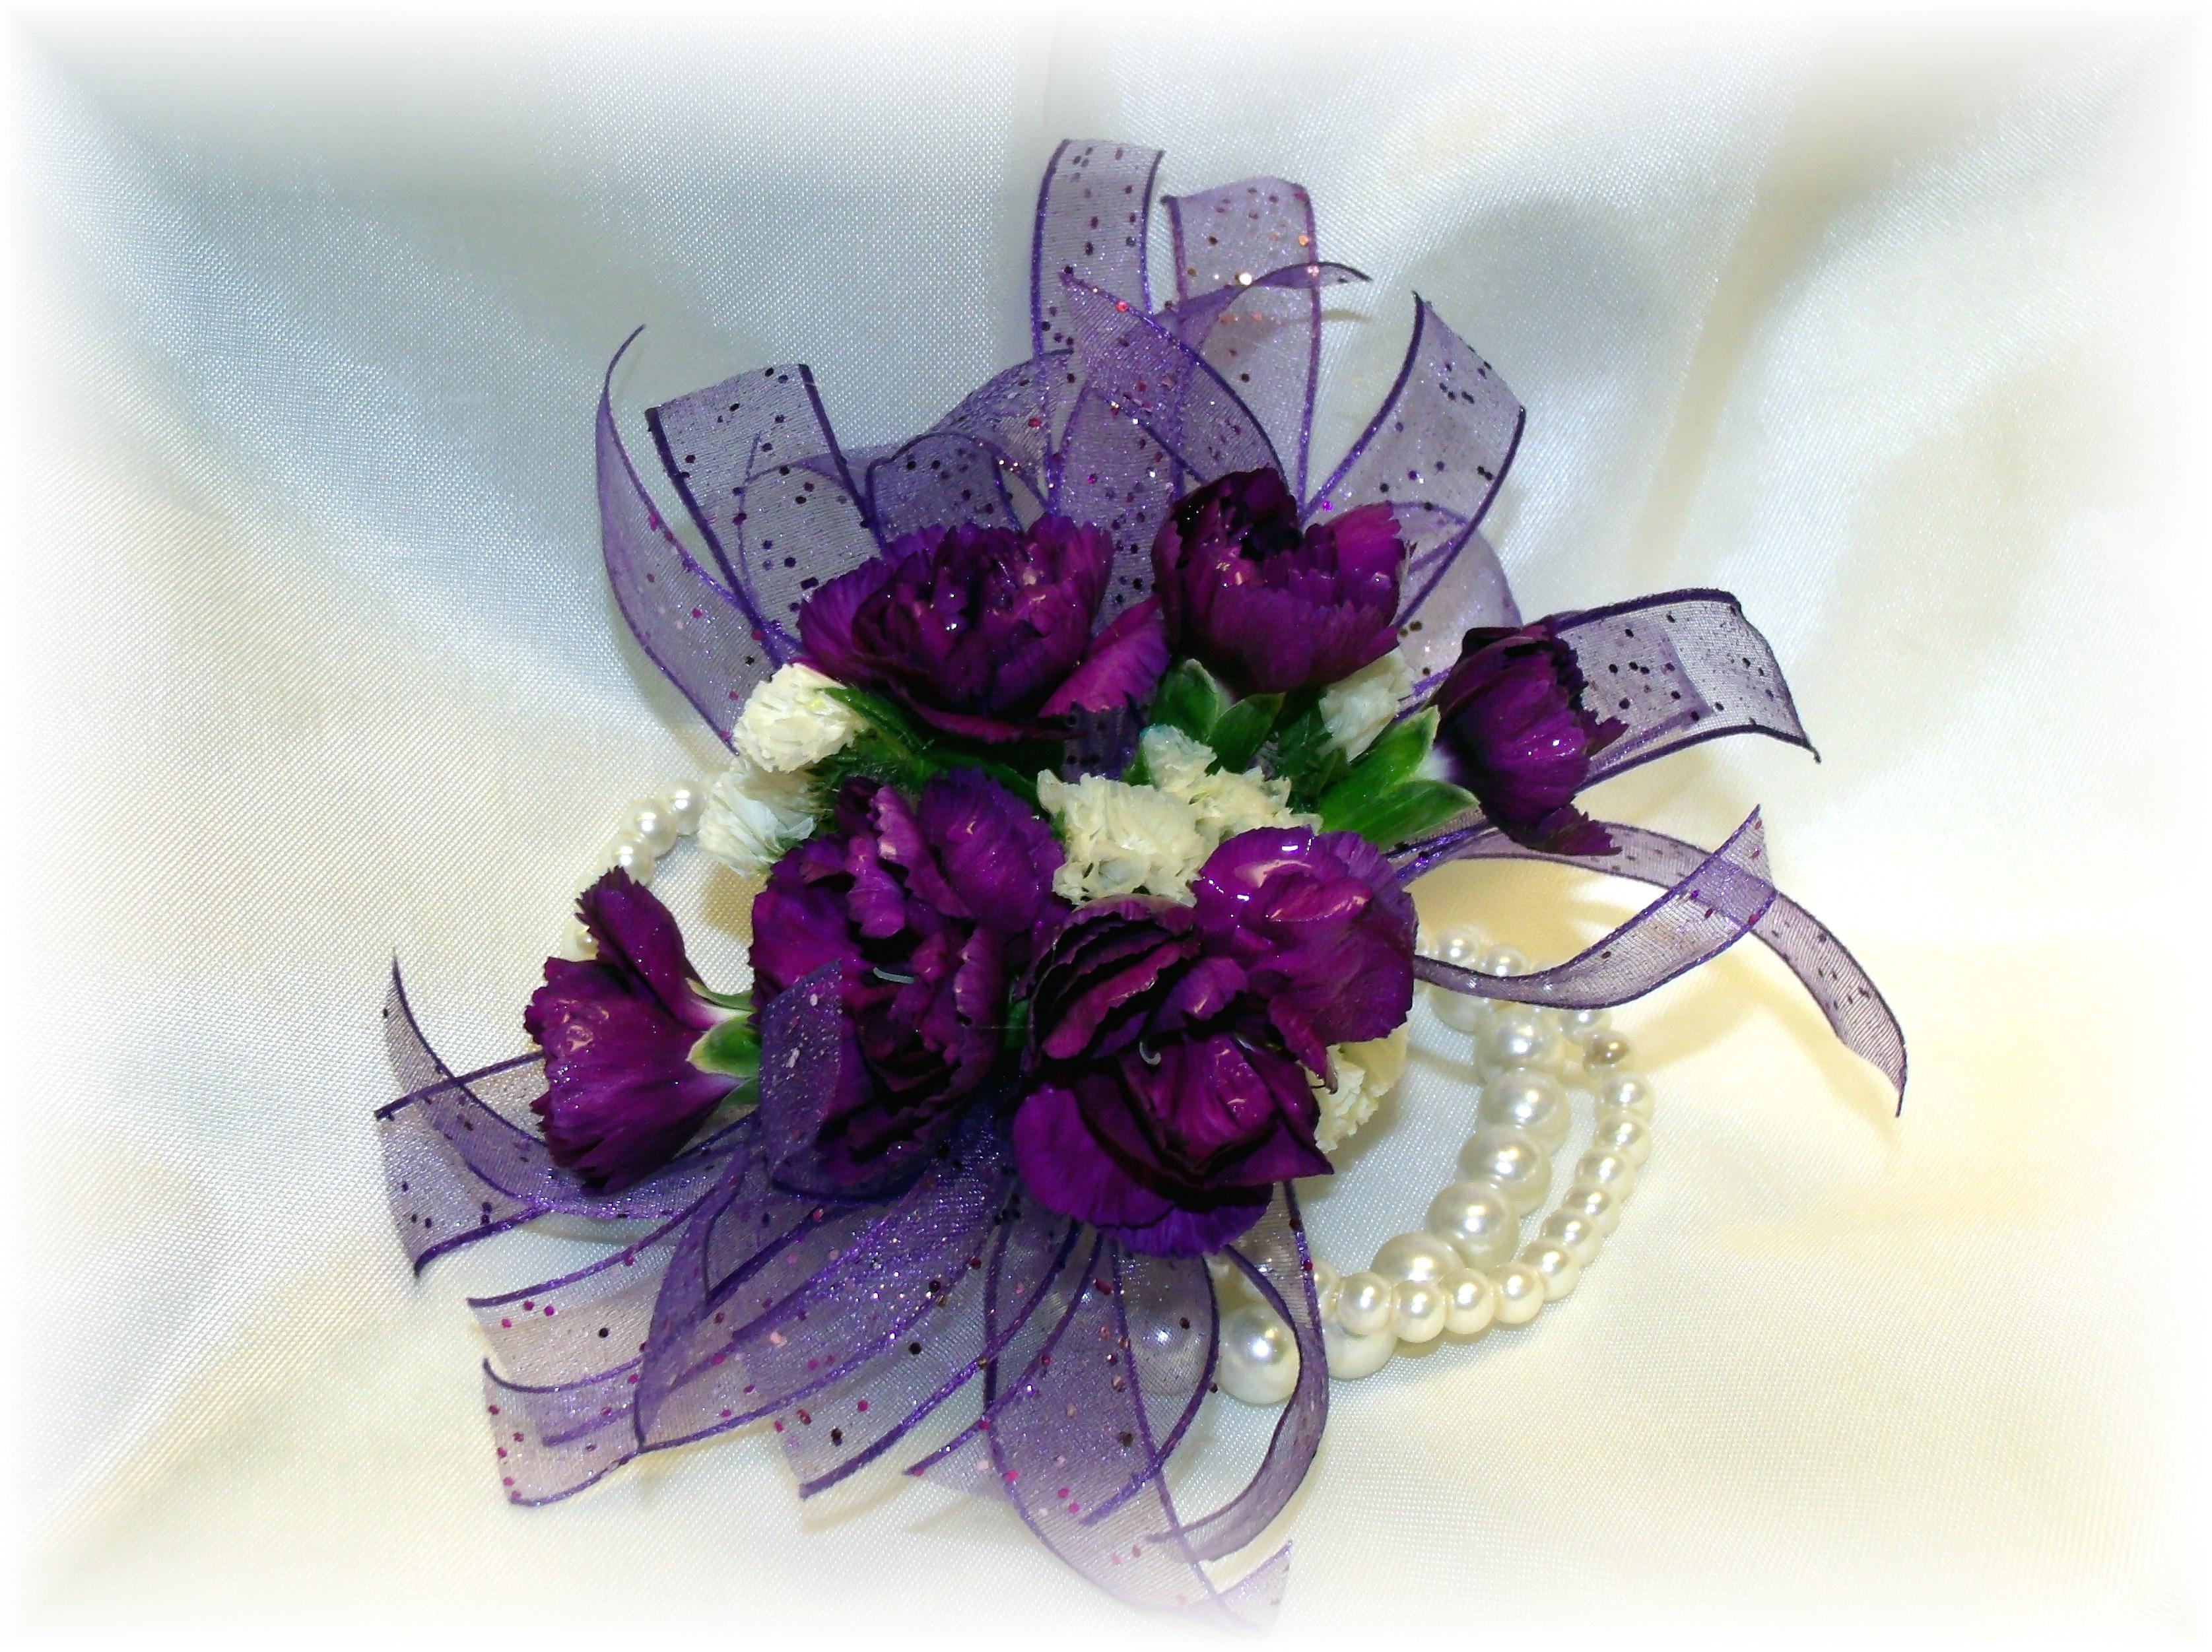 Mini Carnation wirstlet corsage